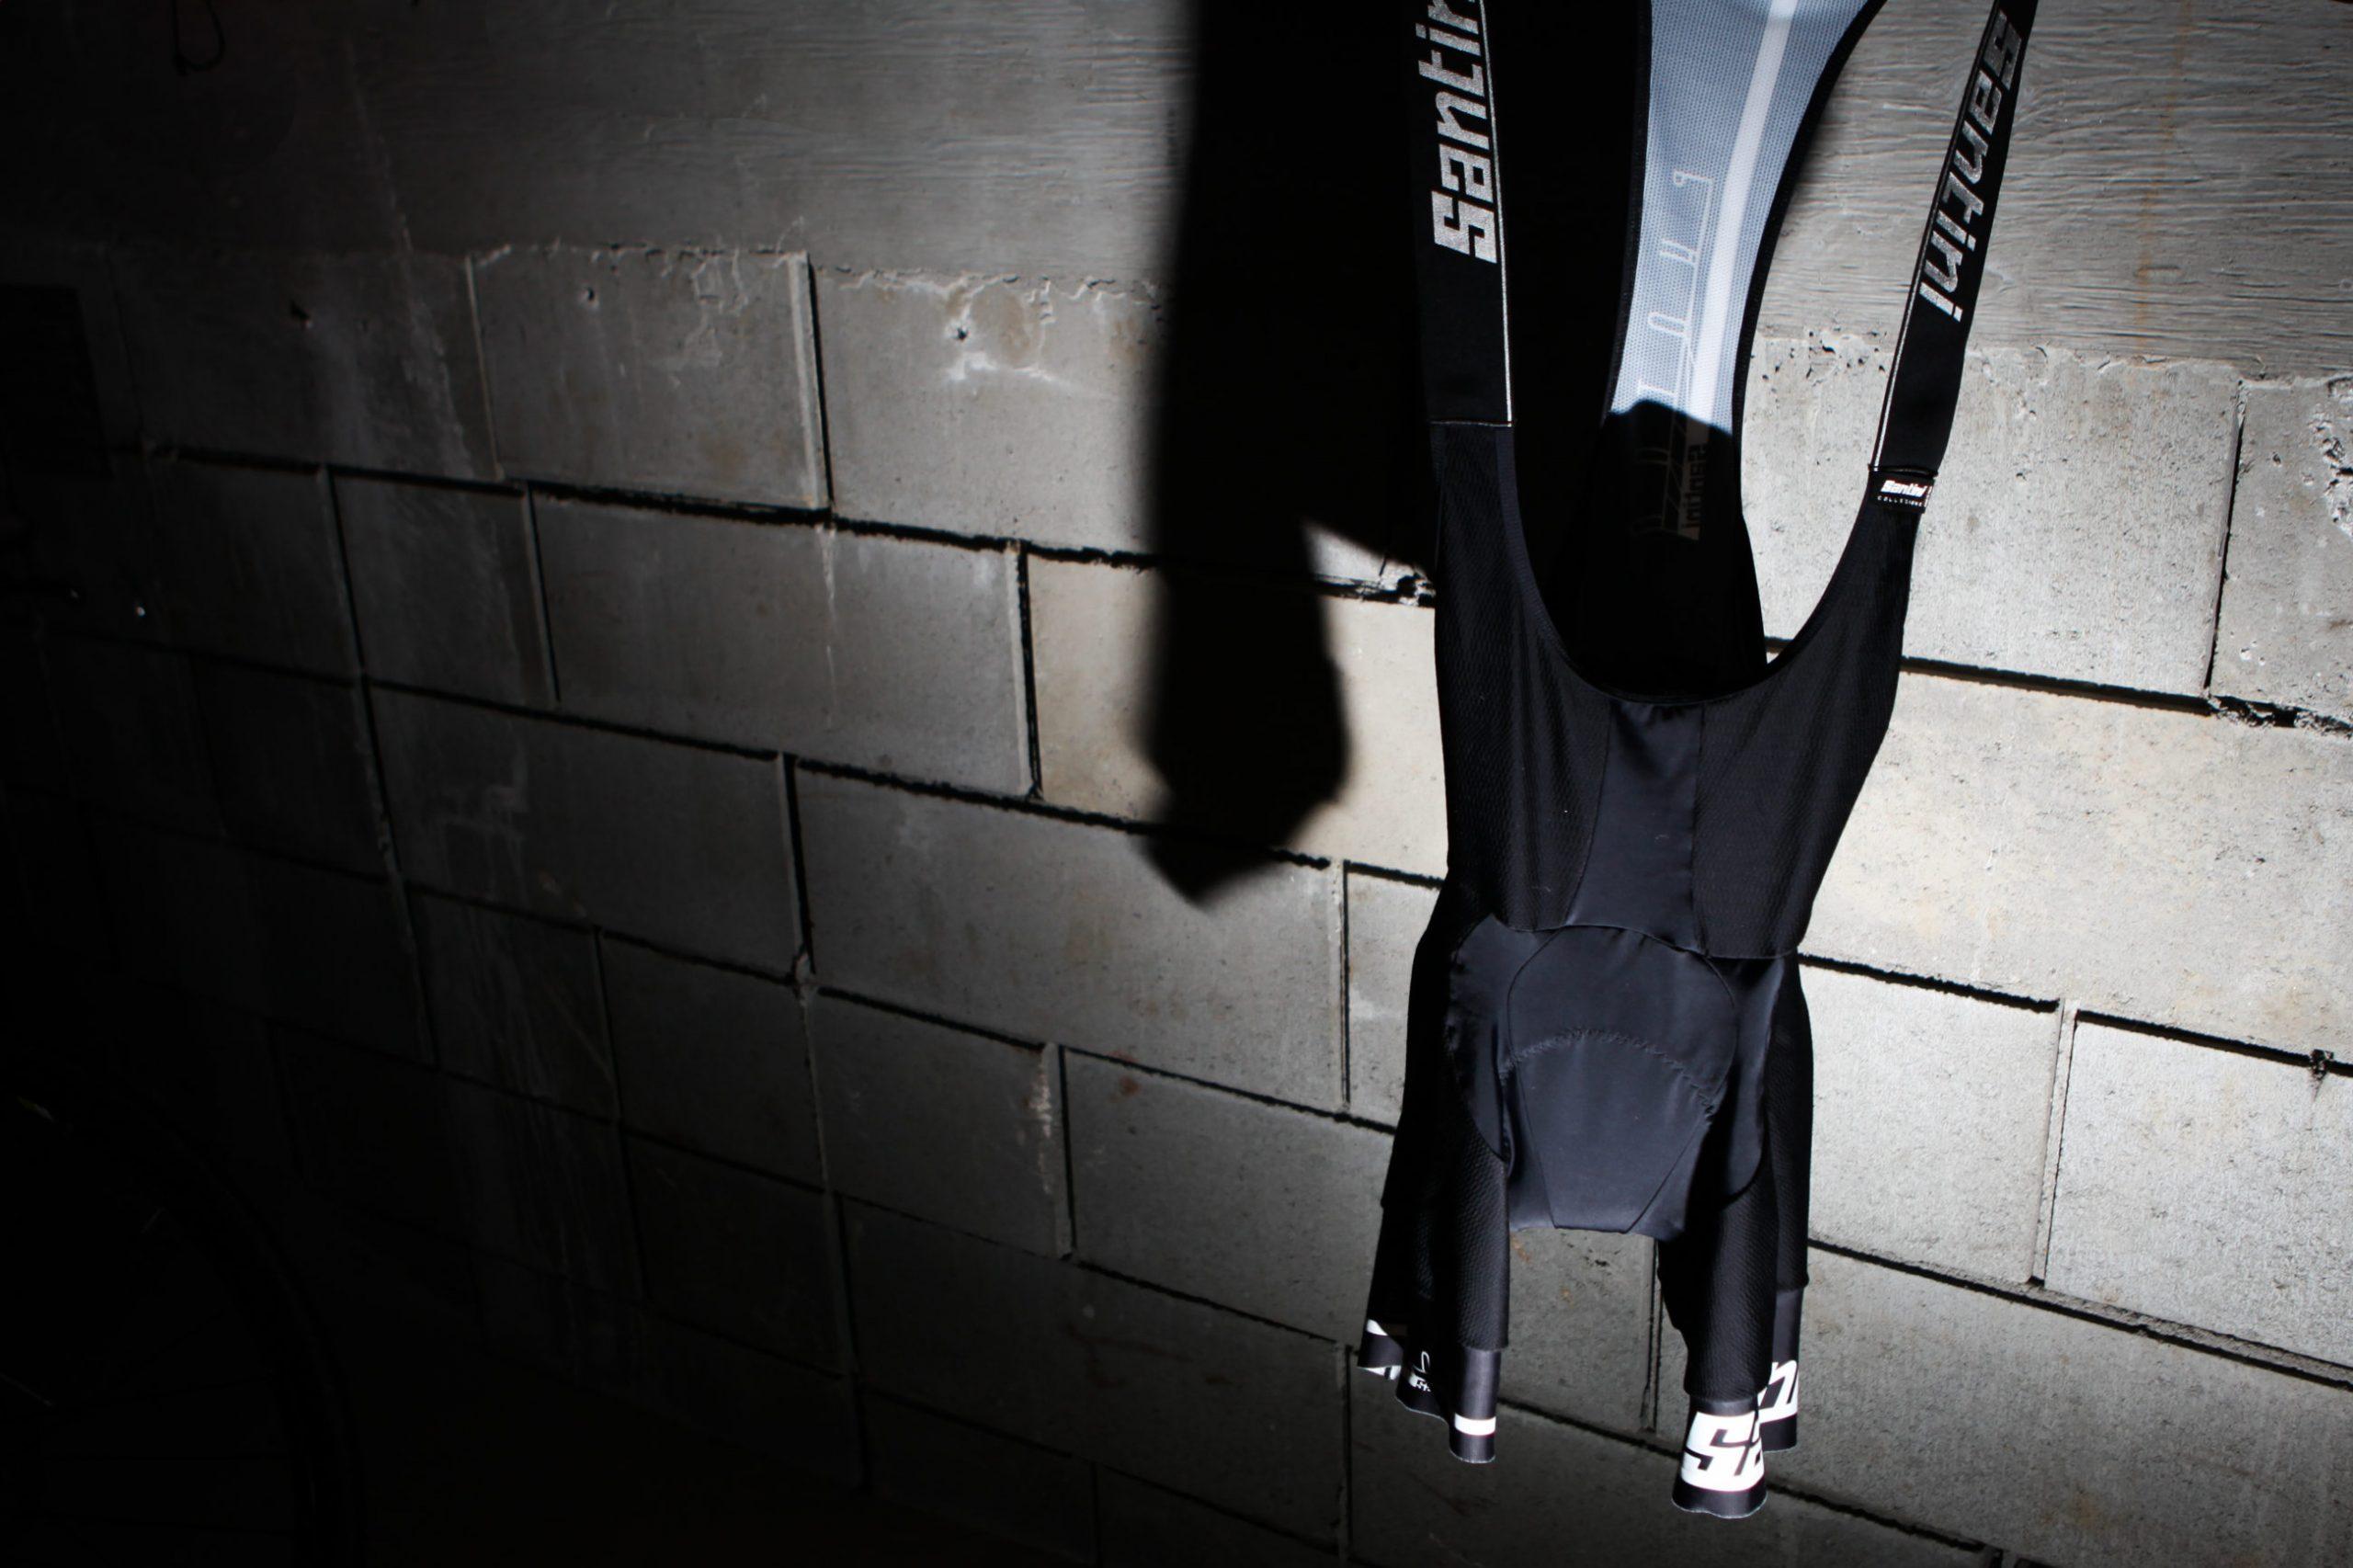 Santini C3: Bukse og pad i verdensklasse